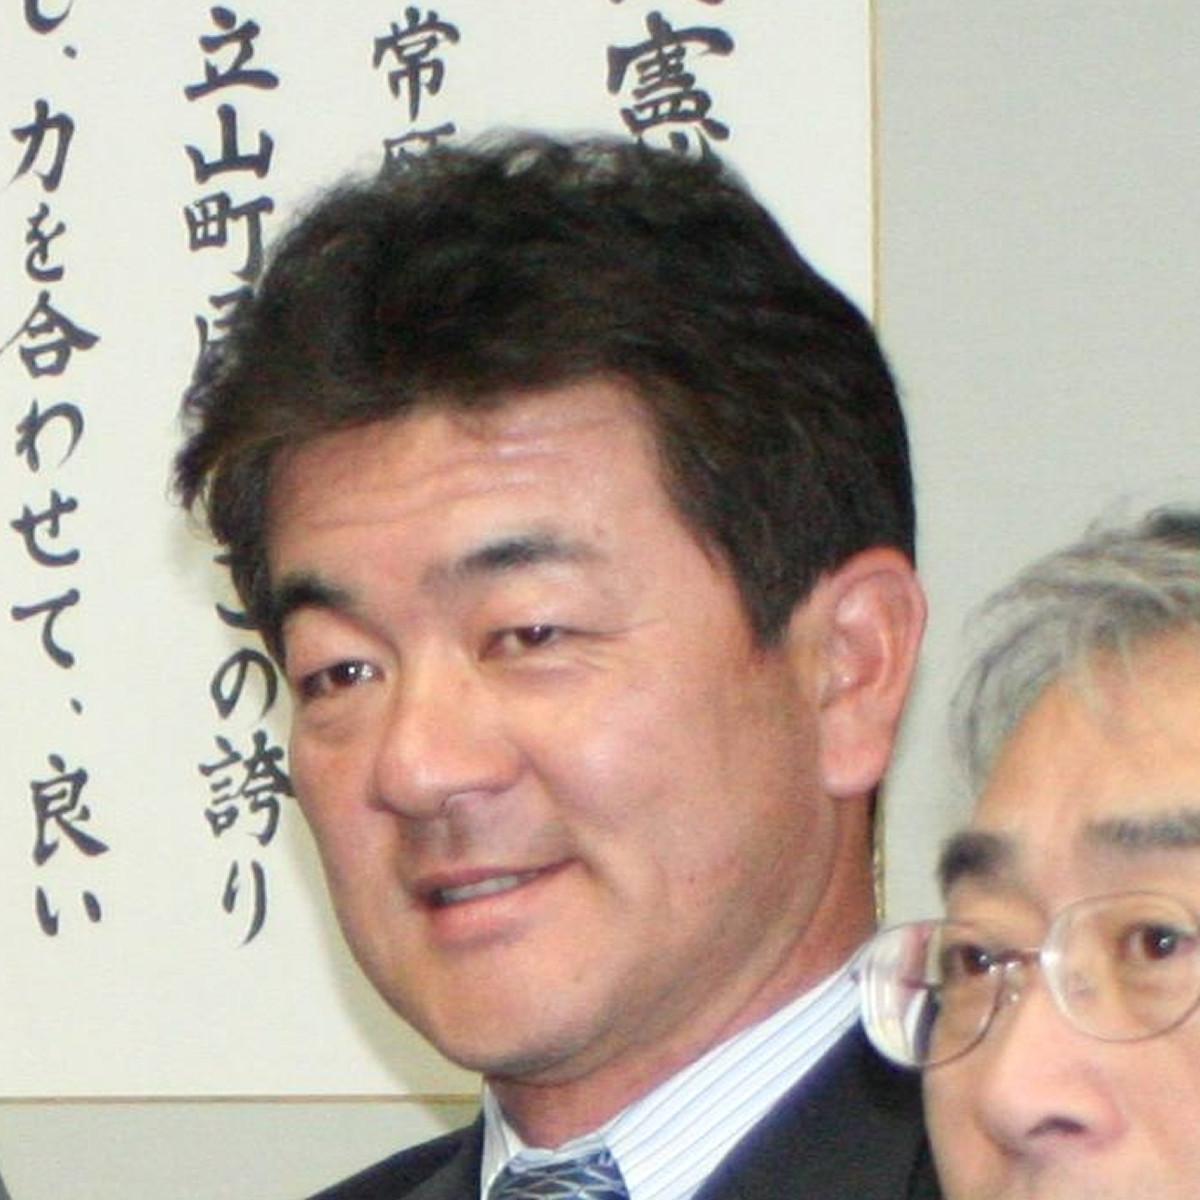 鈴木康友 (野球)の画像 p1_38